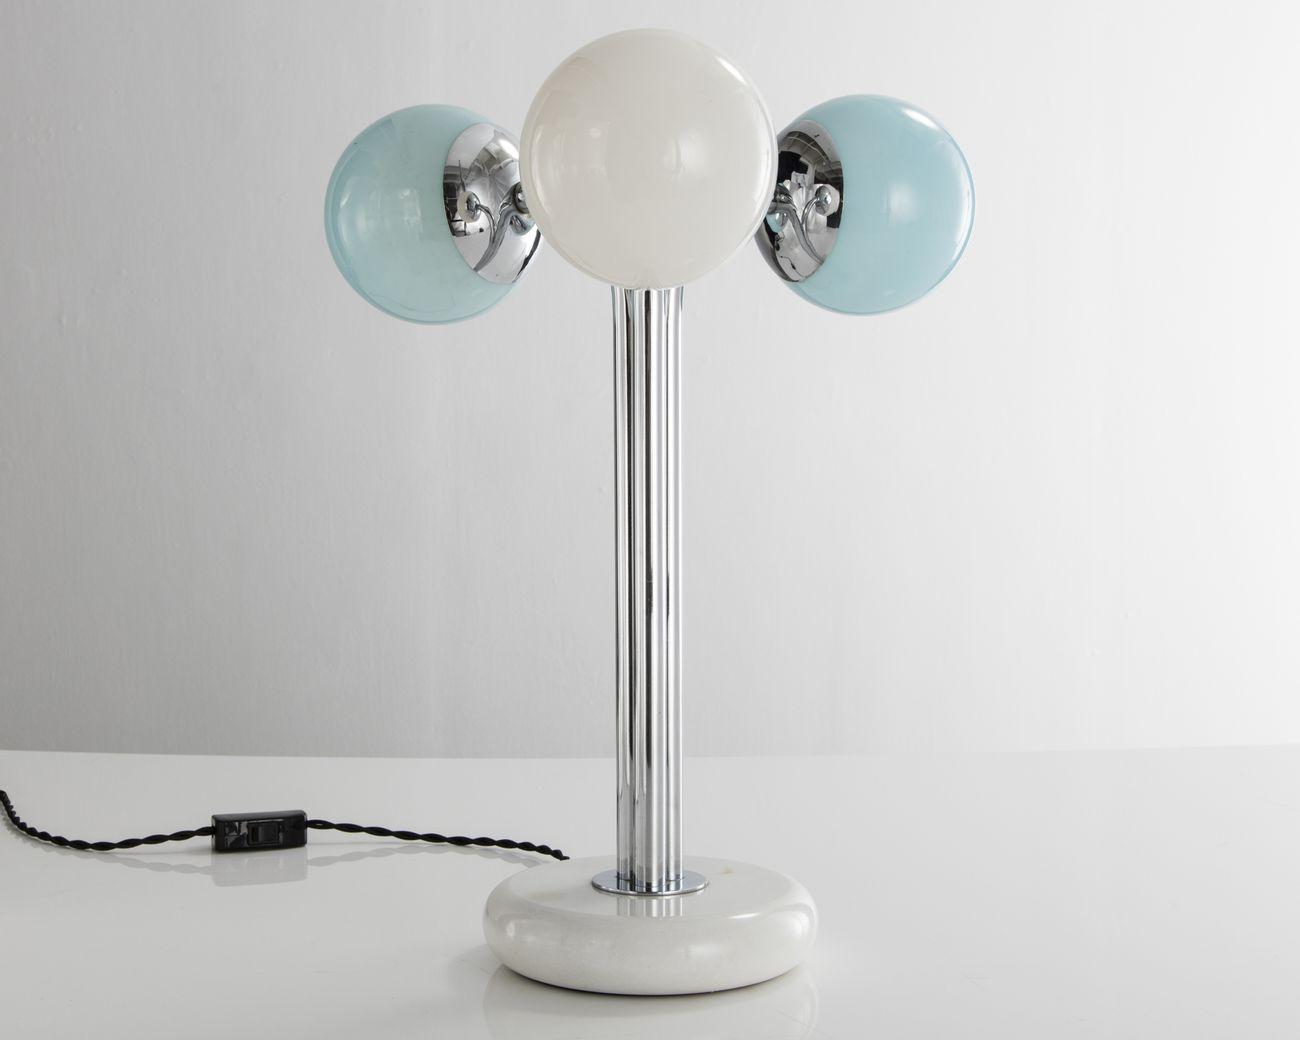 Maria Cristina Didero – SuperDesign. Italian Radical Design 1965-75 (The Monacelli Press, 2017). Polaris Excelsior lamp, designed by Superstudio, 1967, produced by Poltronova. Photo Joe Kramm